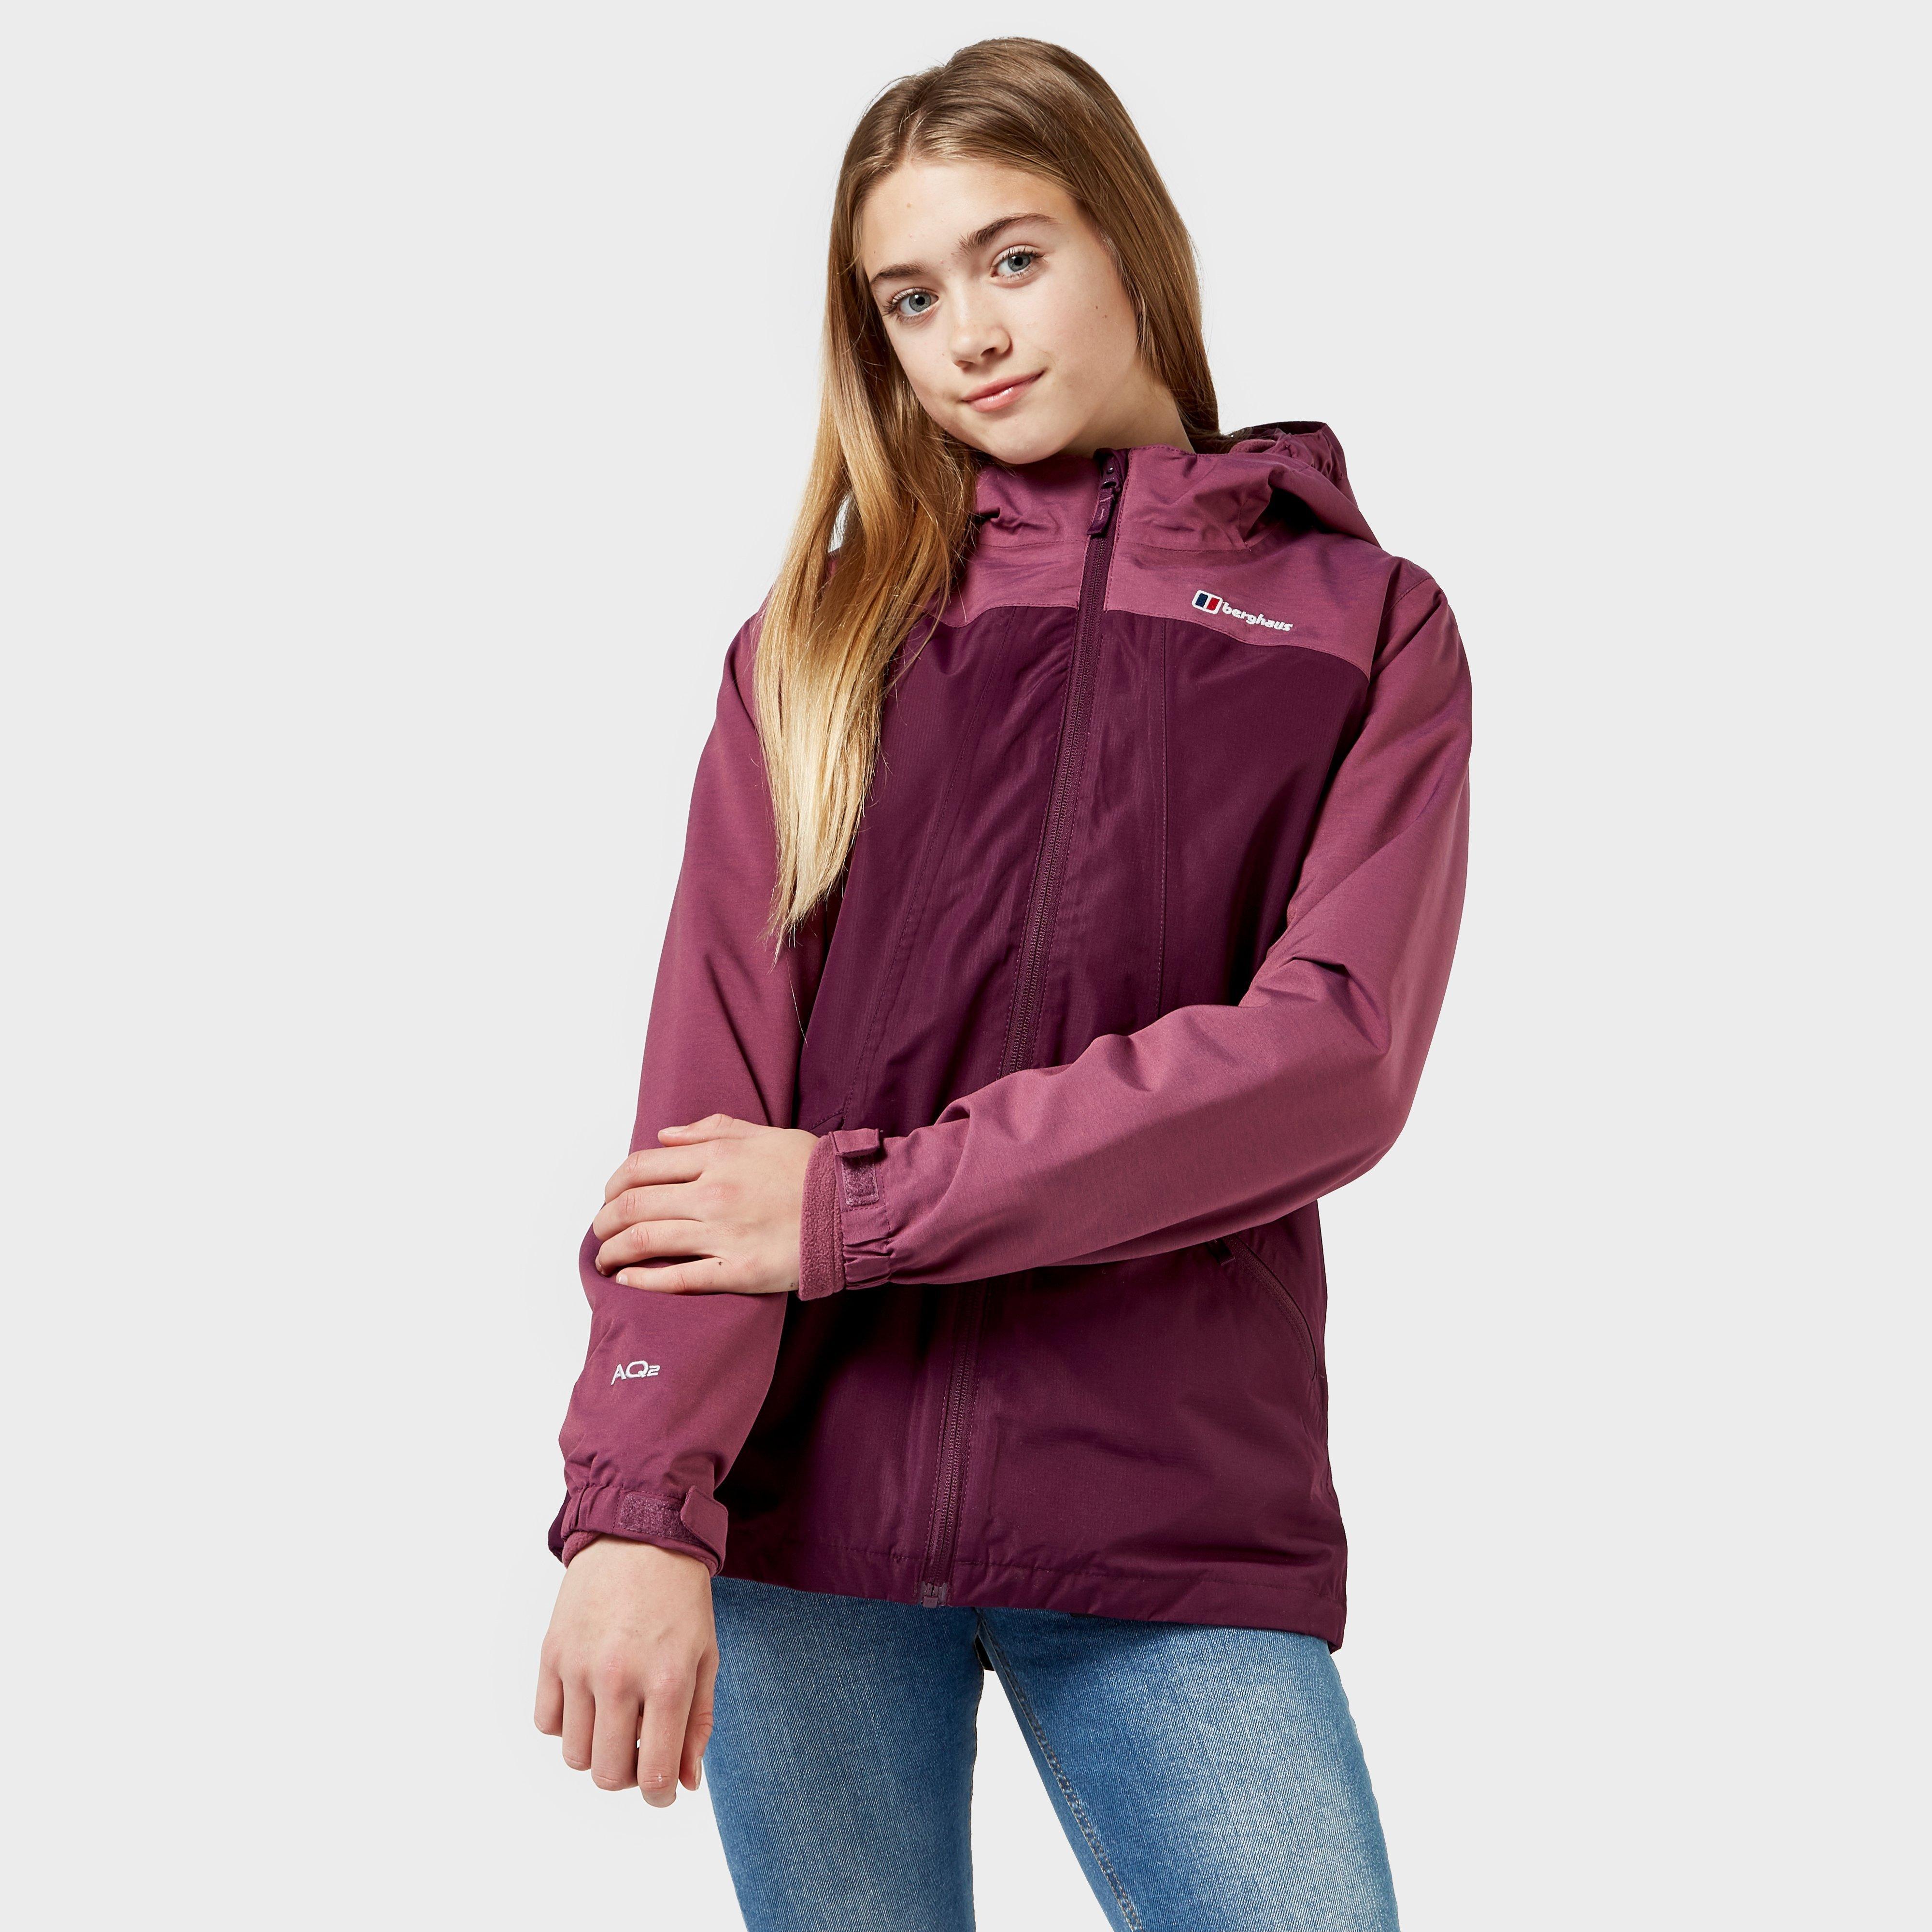 Berghaus Kids Grasholm 3in1 Jacket - Pink/purple  Pink/purple